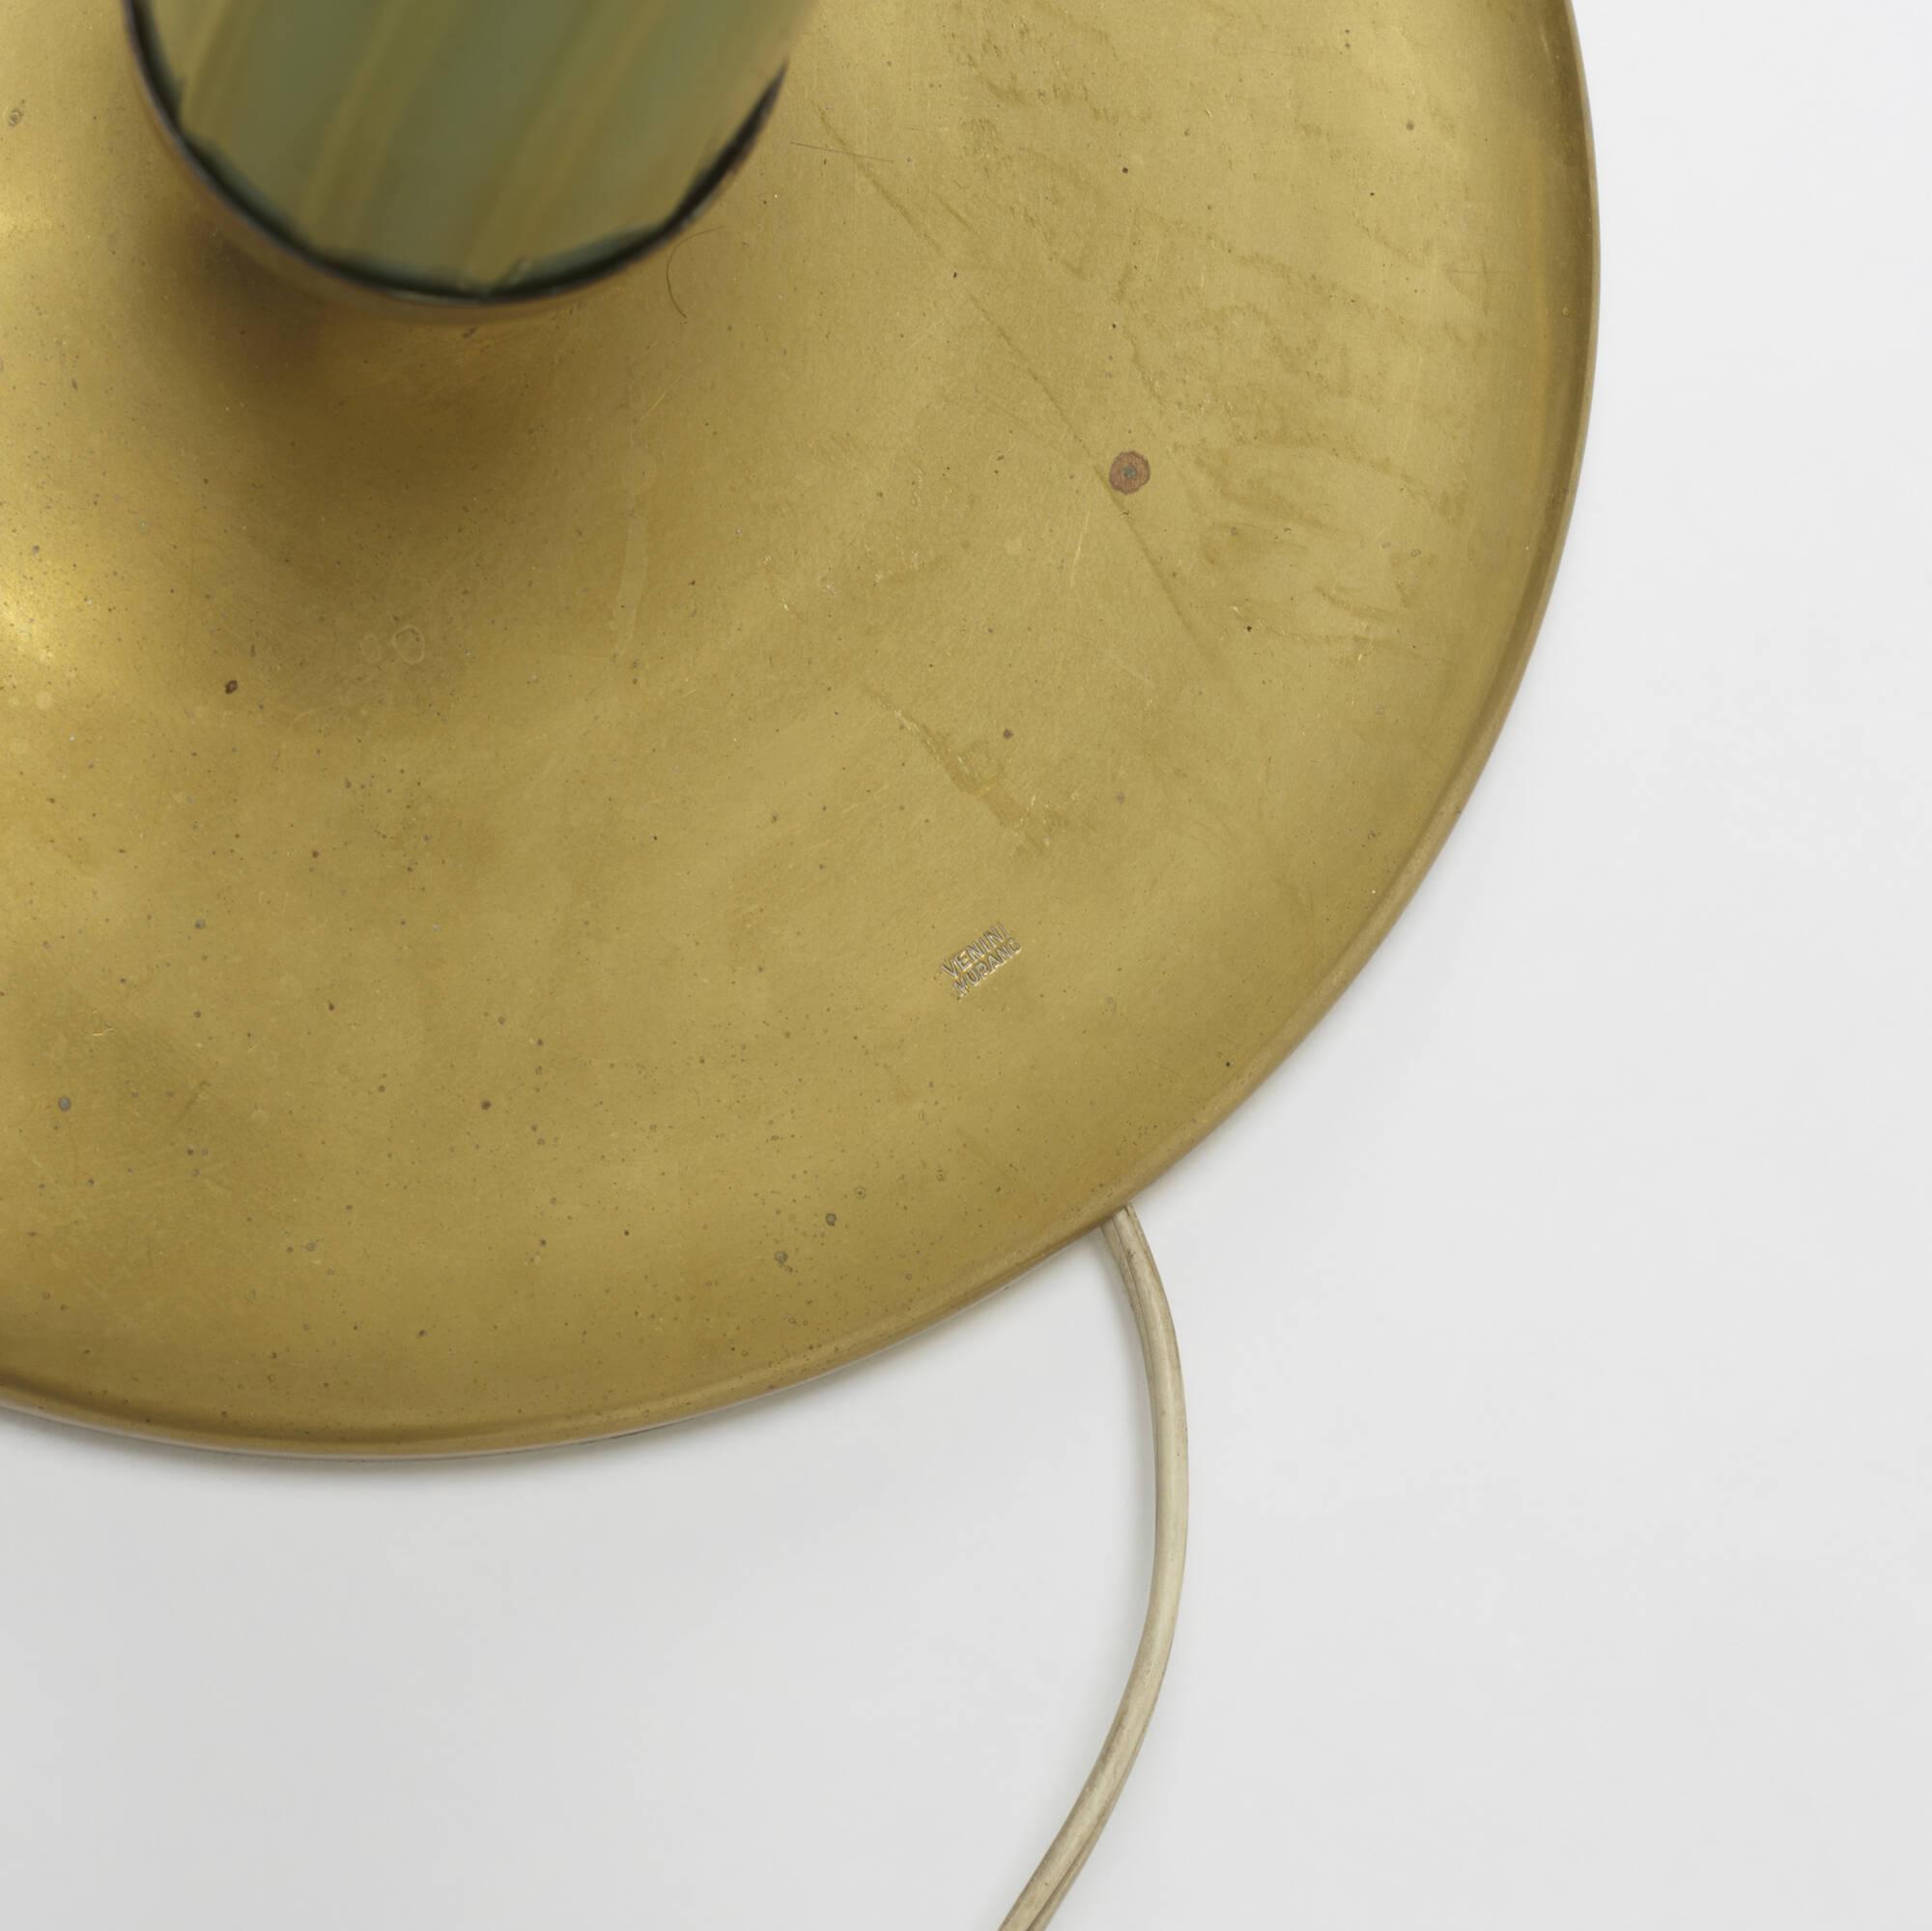 192: Tomaso Buzzi / floor lamp, model 502 (3 of 3)